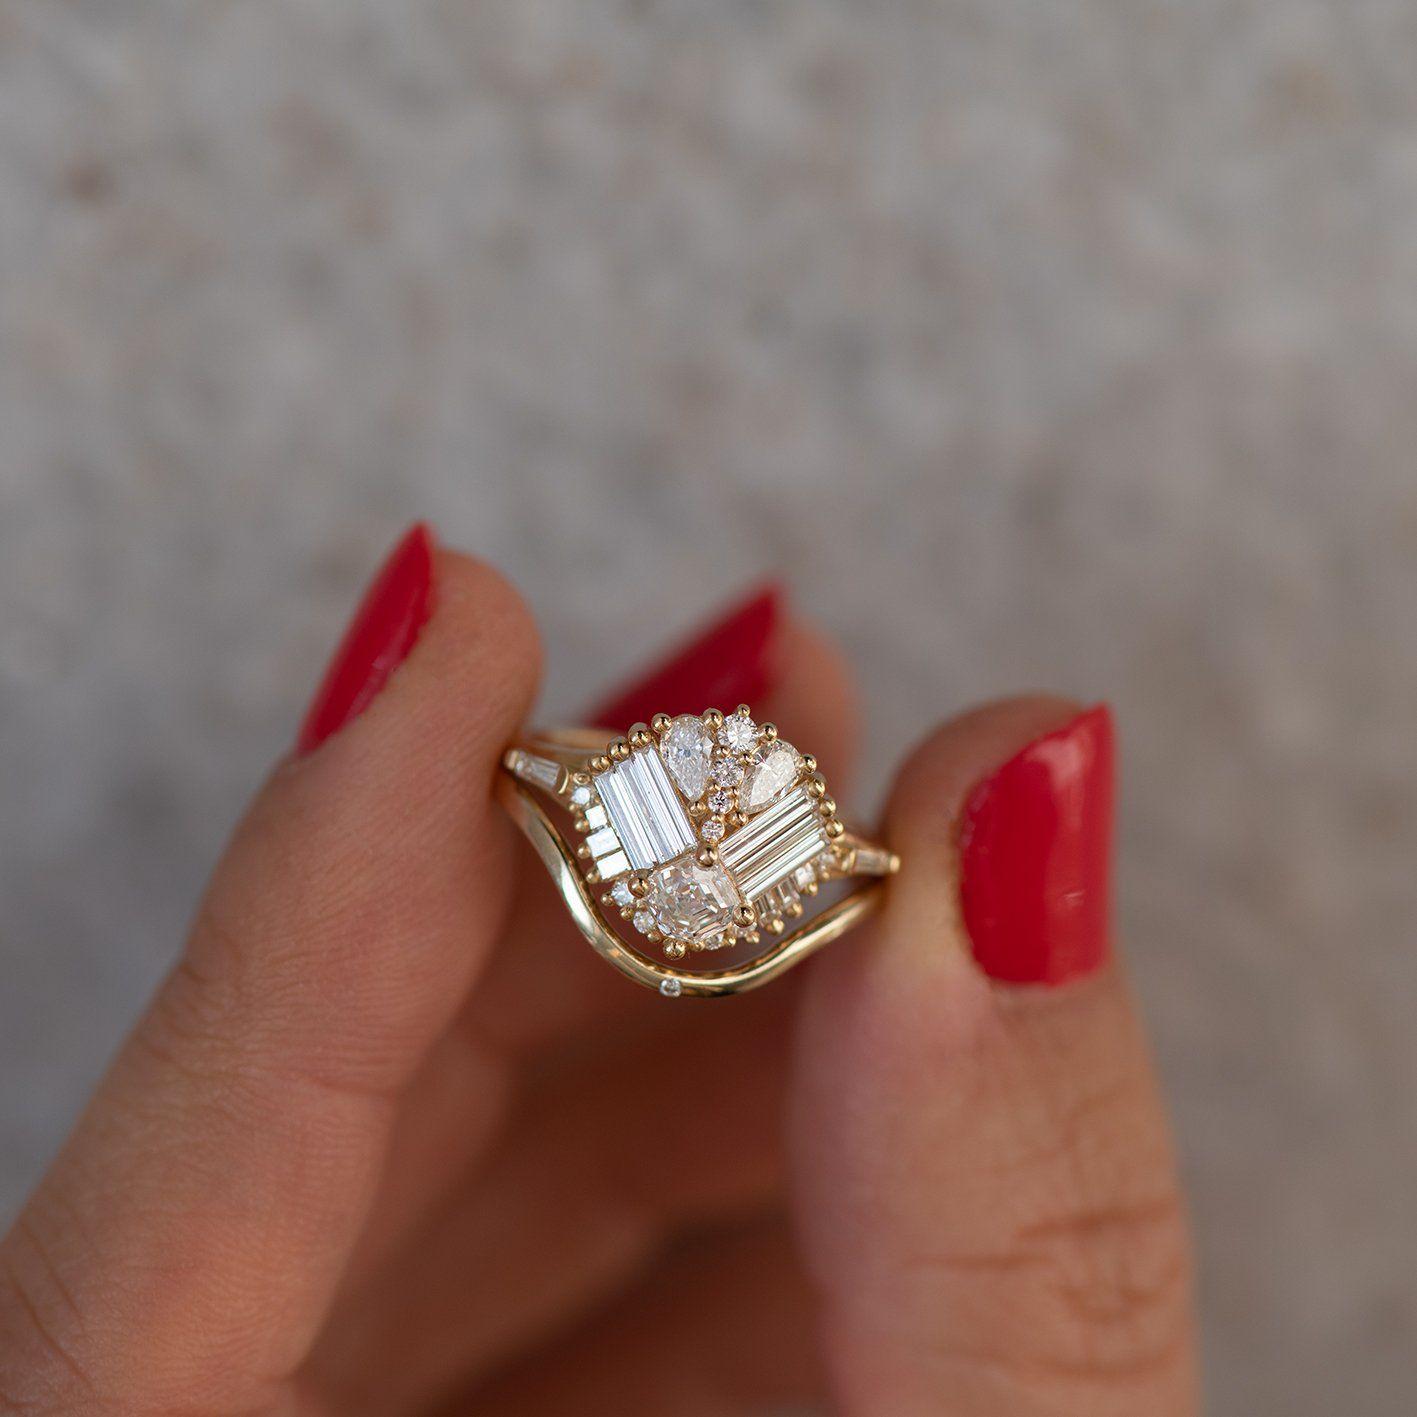 Mirrored Cluster Ring with Asscher Cut Diamond